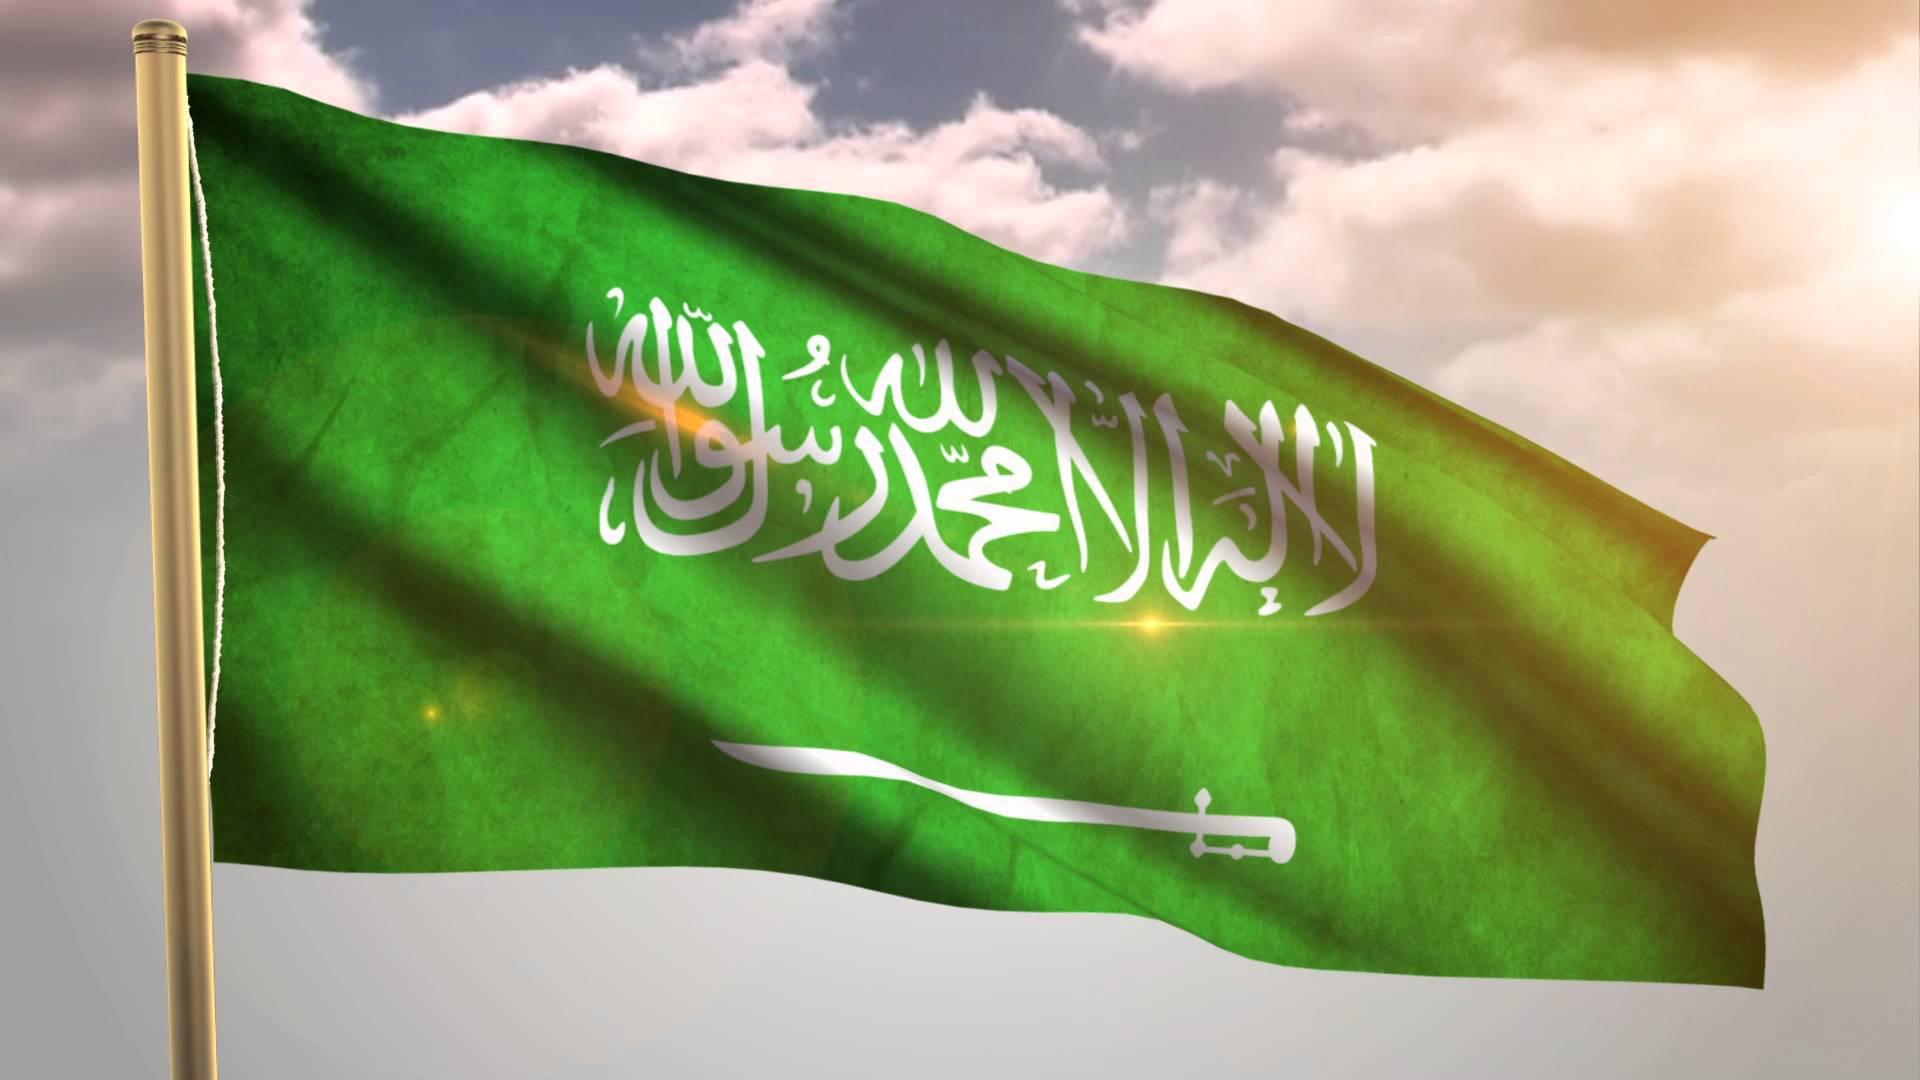 Photo of السعودية.. ماذا يعني تخفيف الإجراءات الاحترازية رغم الحالات اليومية؟ استشاري يجيب